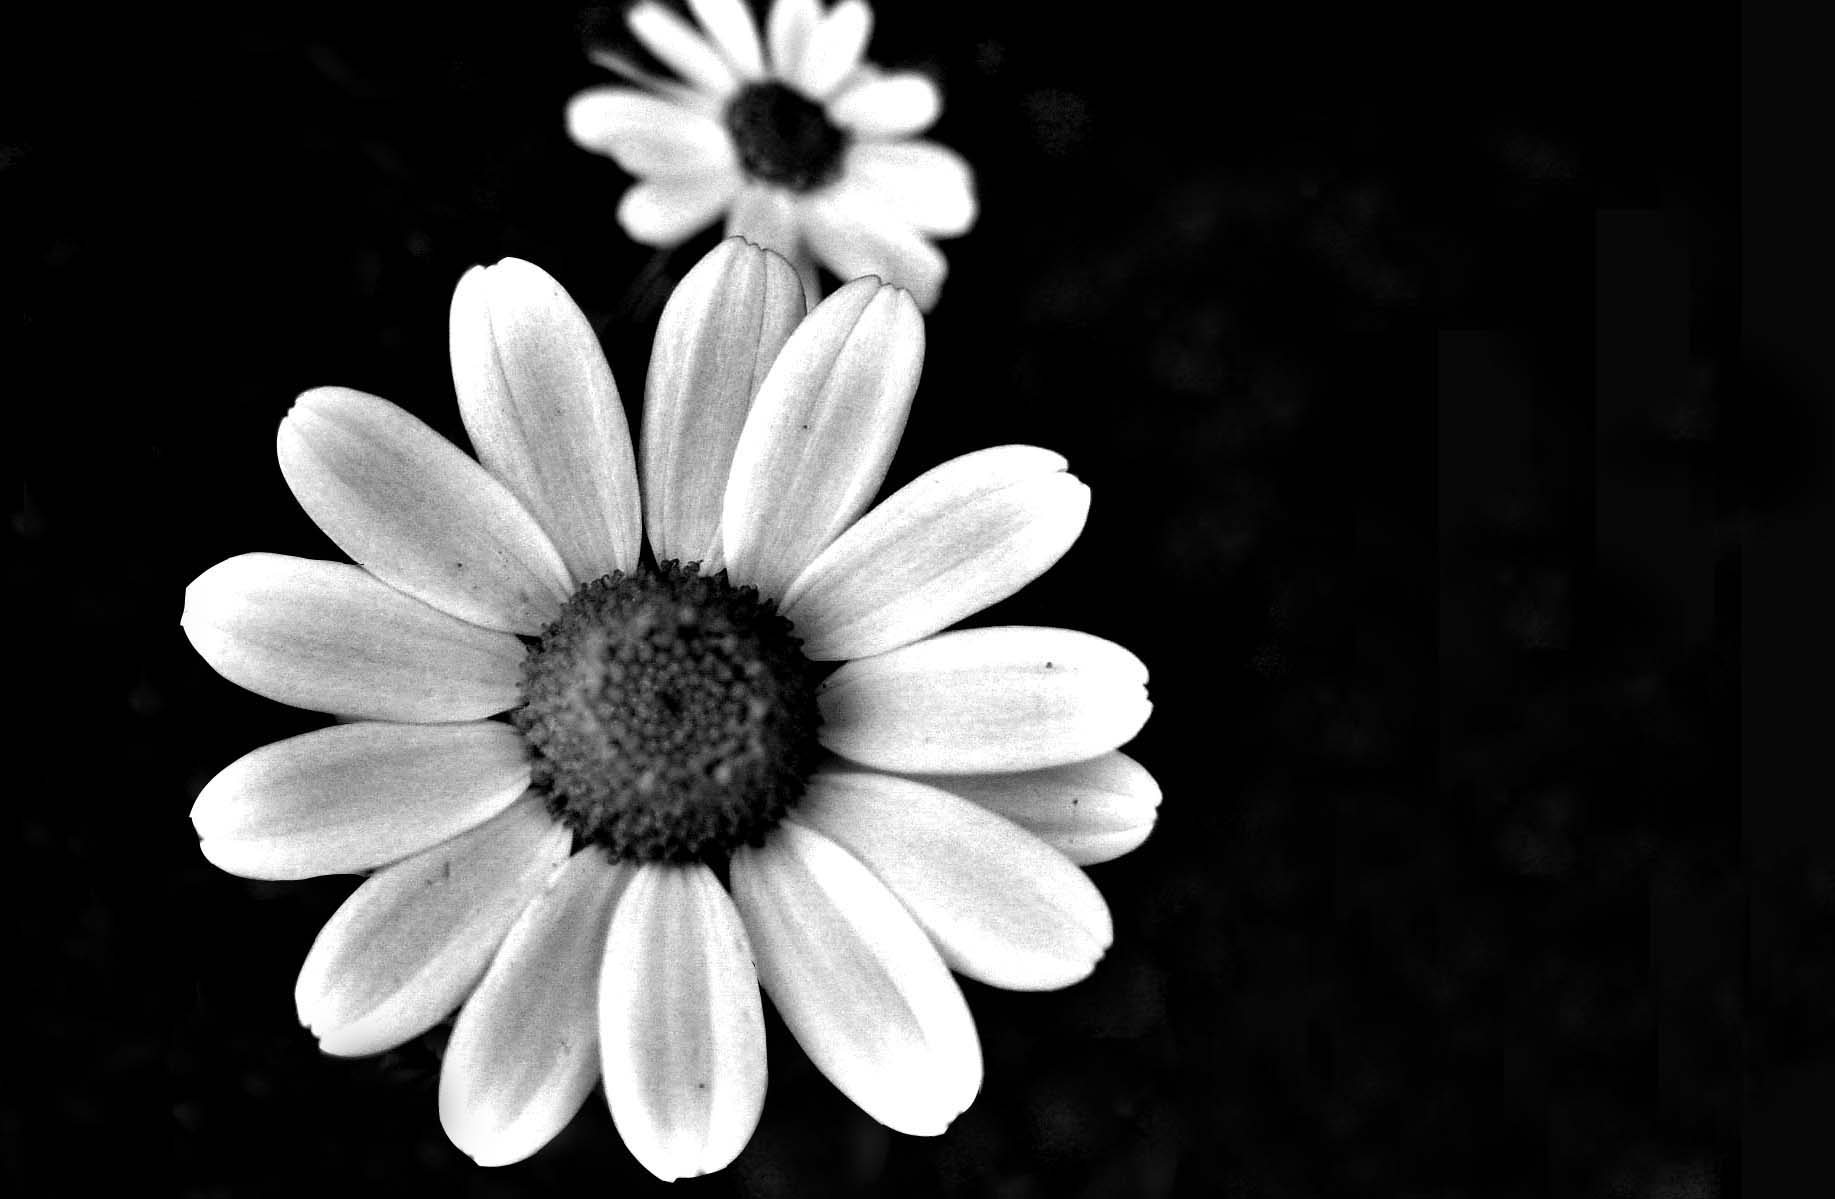 Black And White Floral Wallpaper Background Rt Ltd